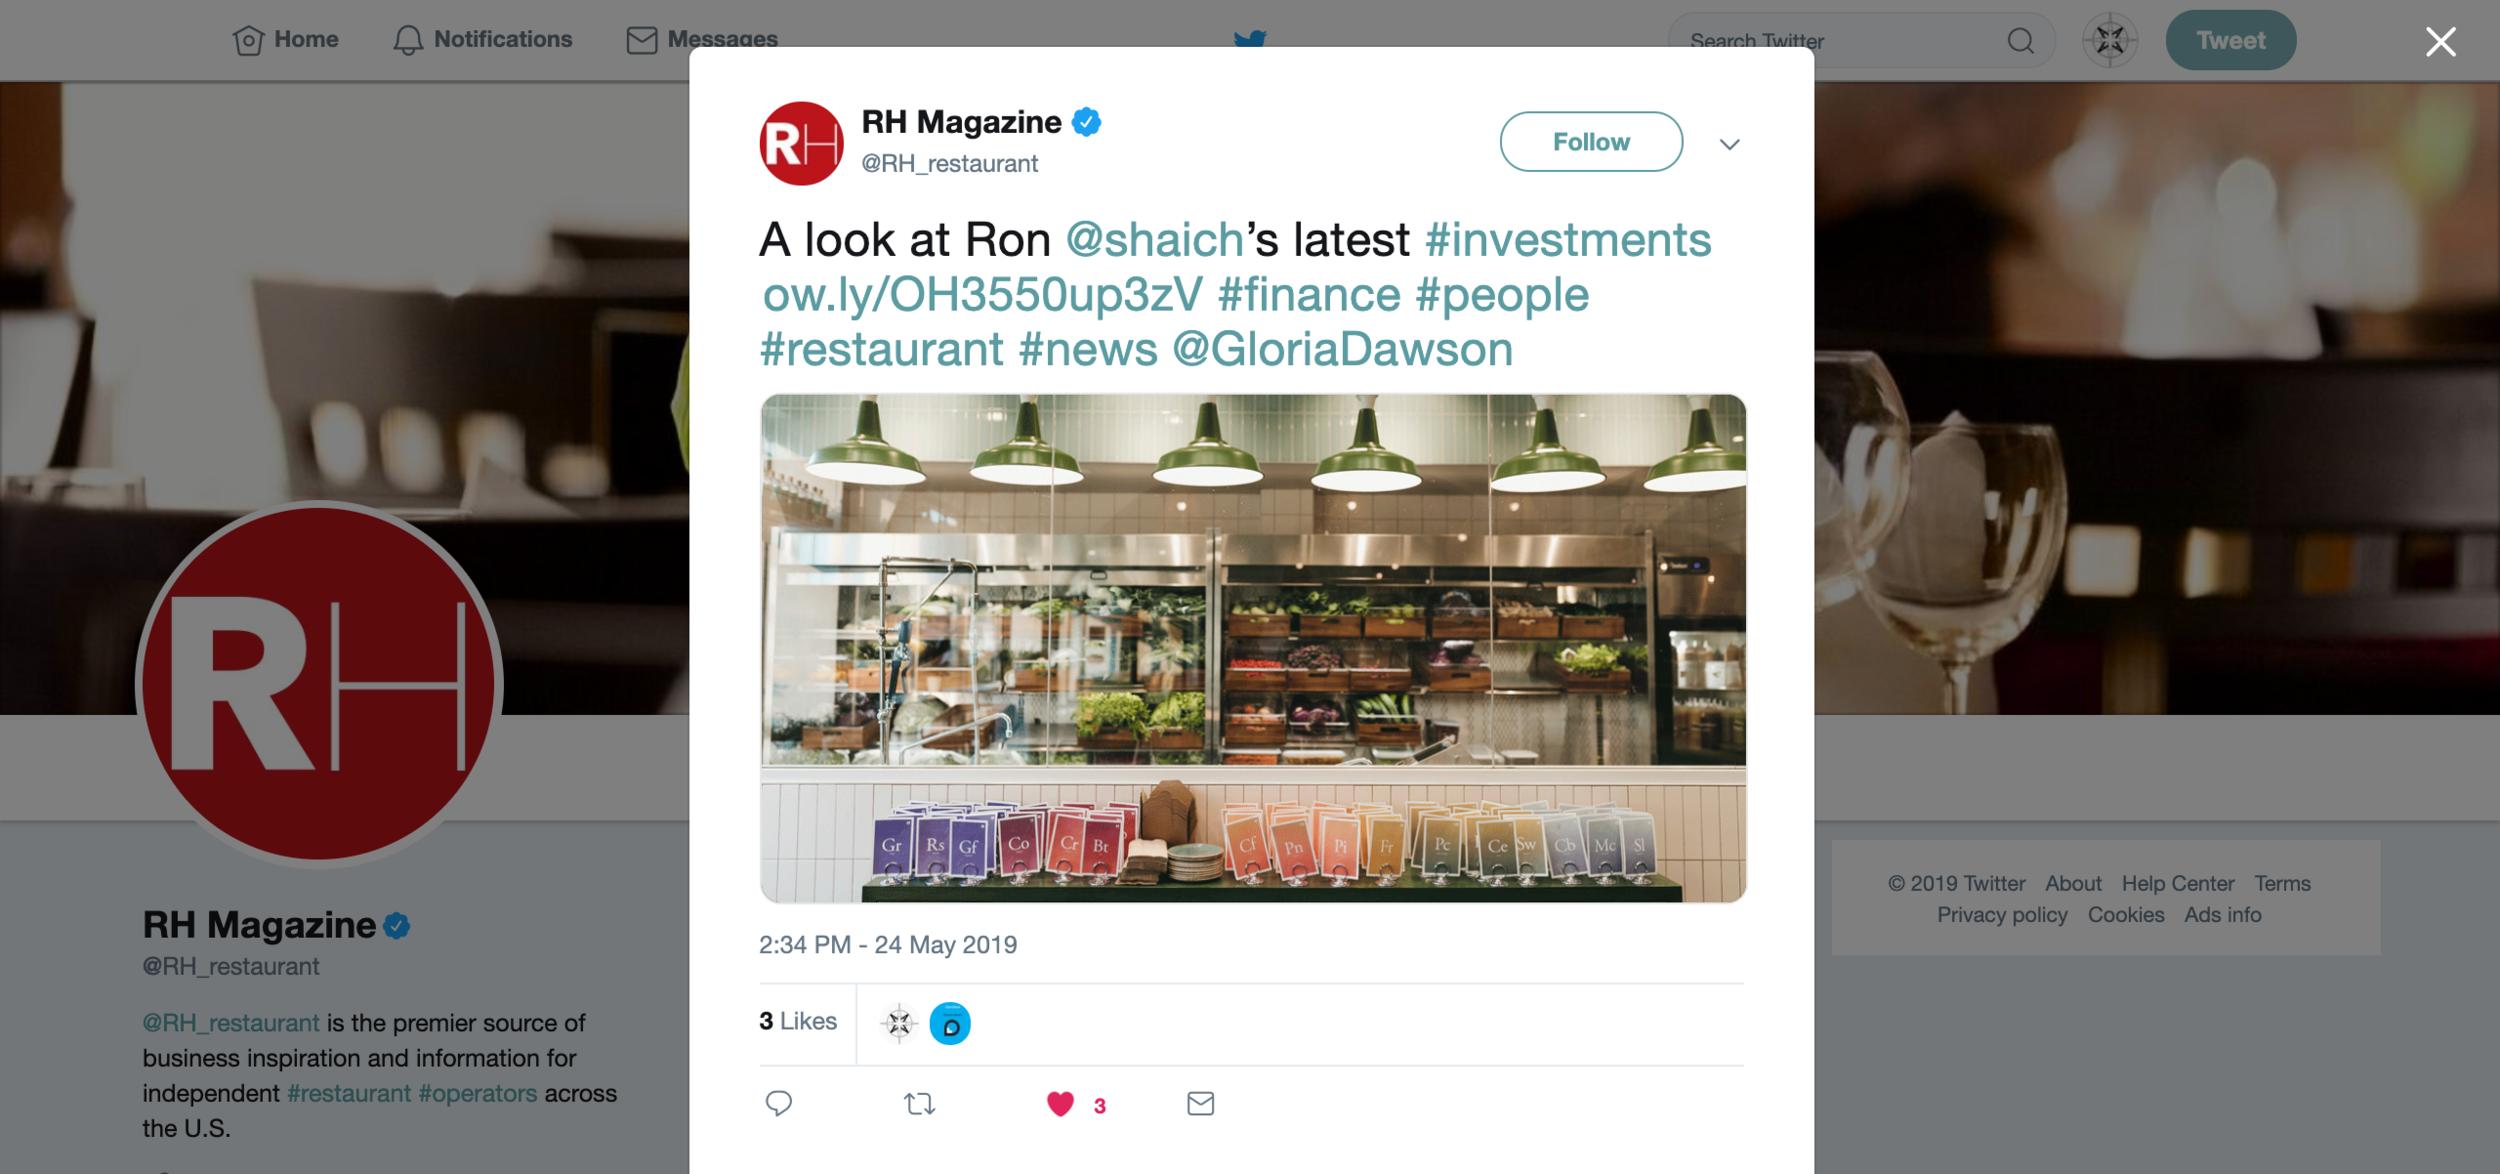 2019.05.24_Restaurant Hospitality, Twitter_Life Alive Back Bay Act III slideshow.png